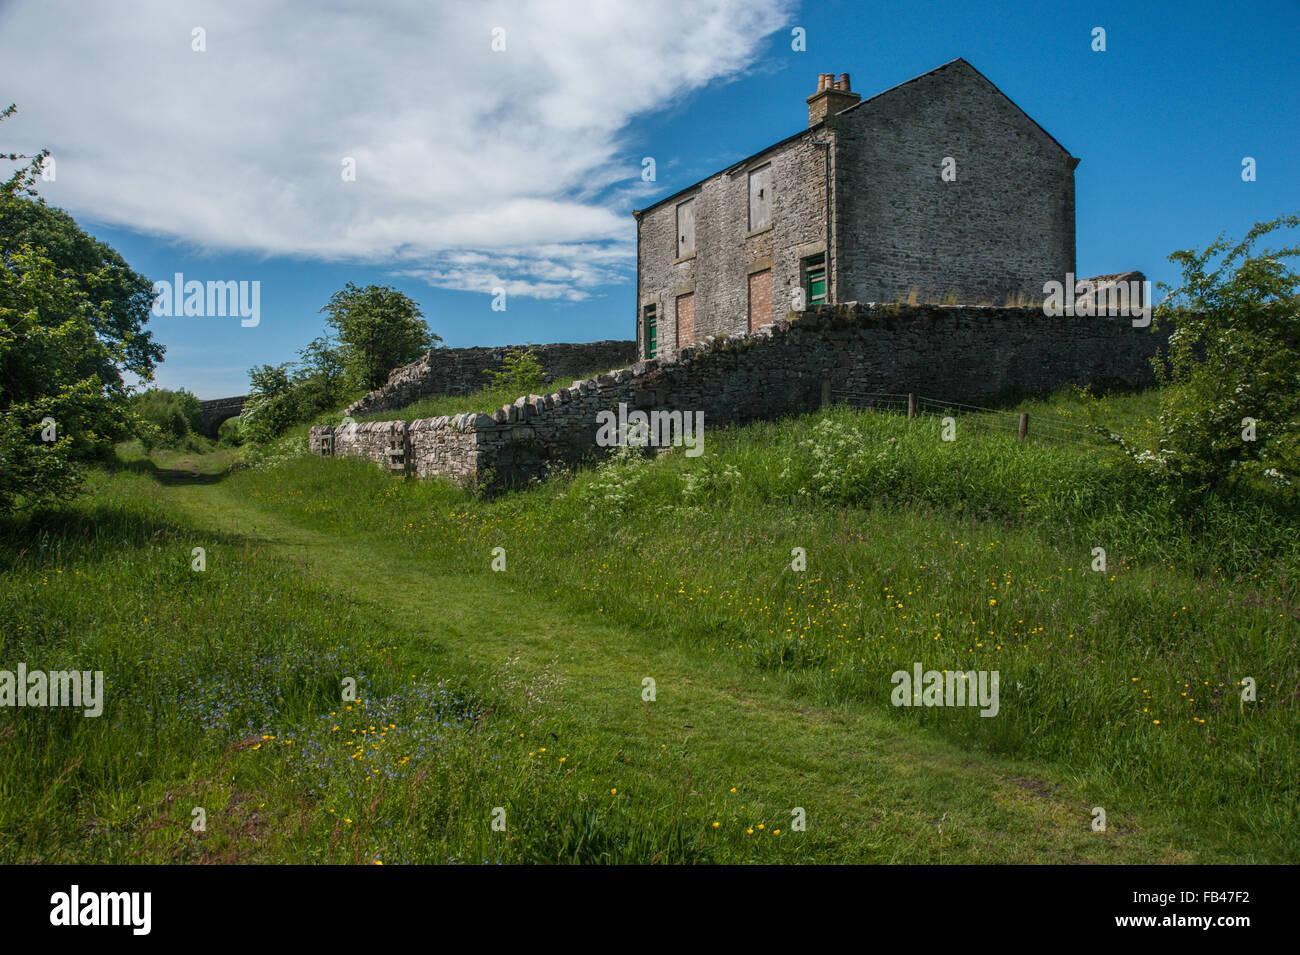 Derelict houses beside dismantled railway line - Stock Image